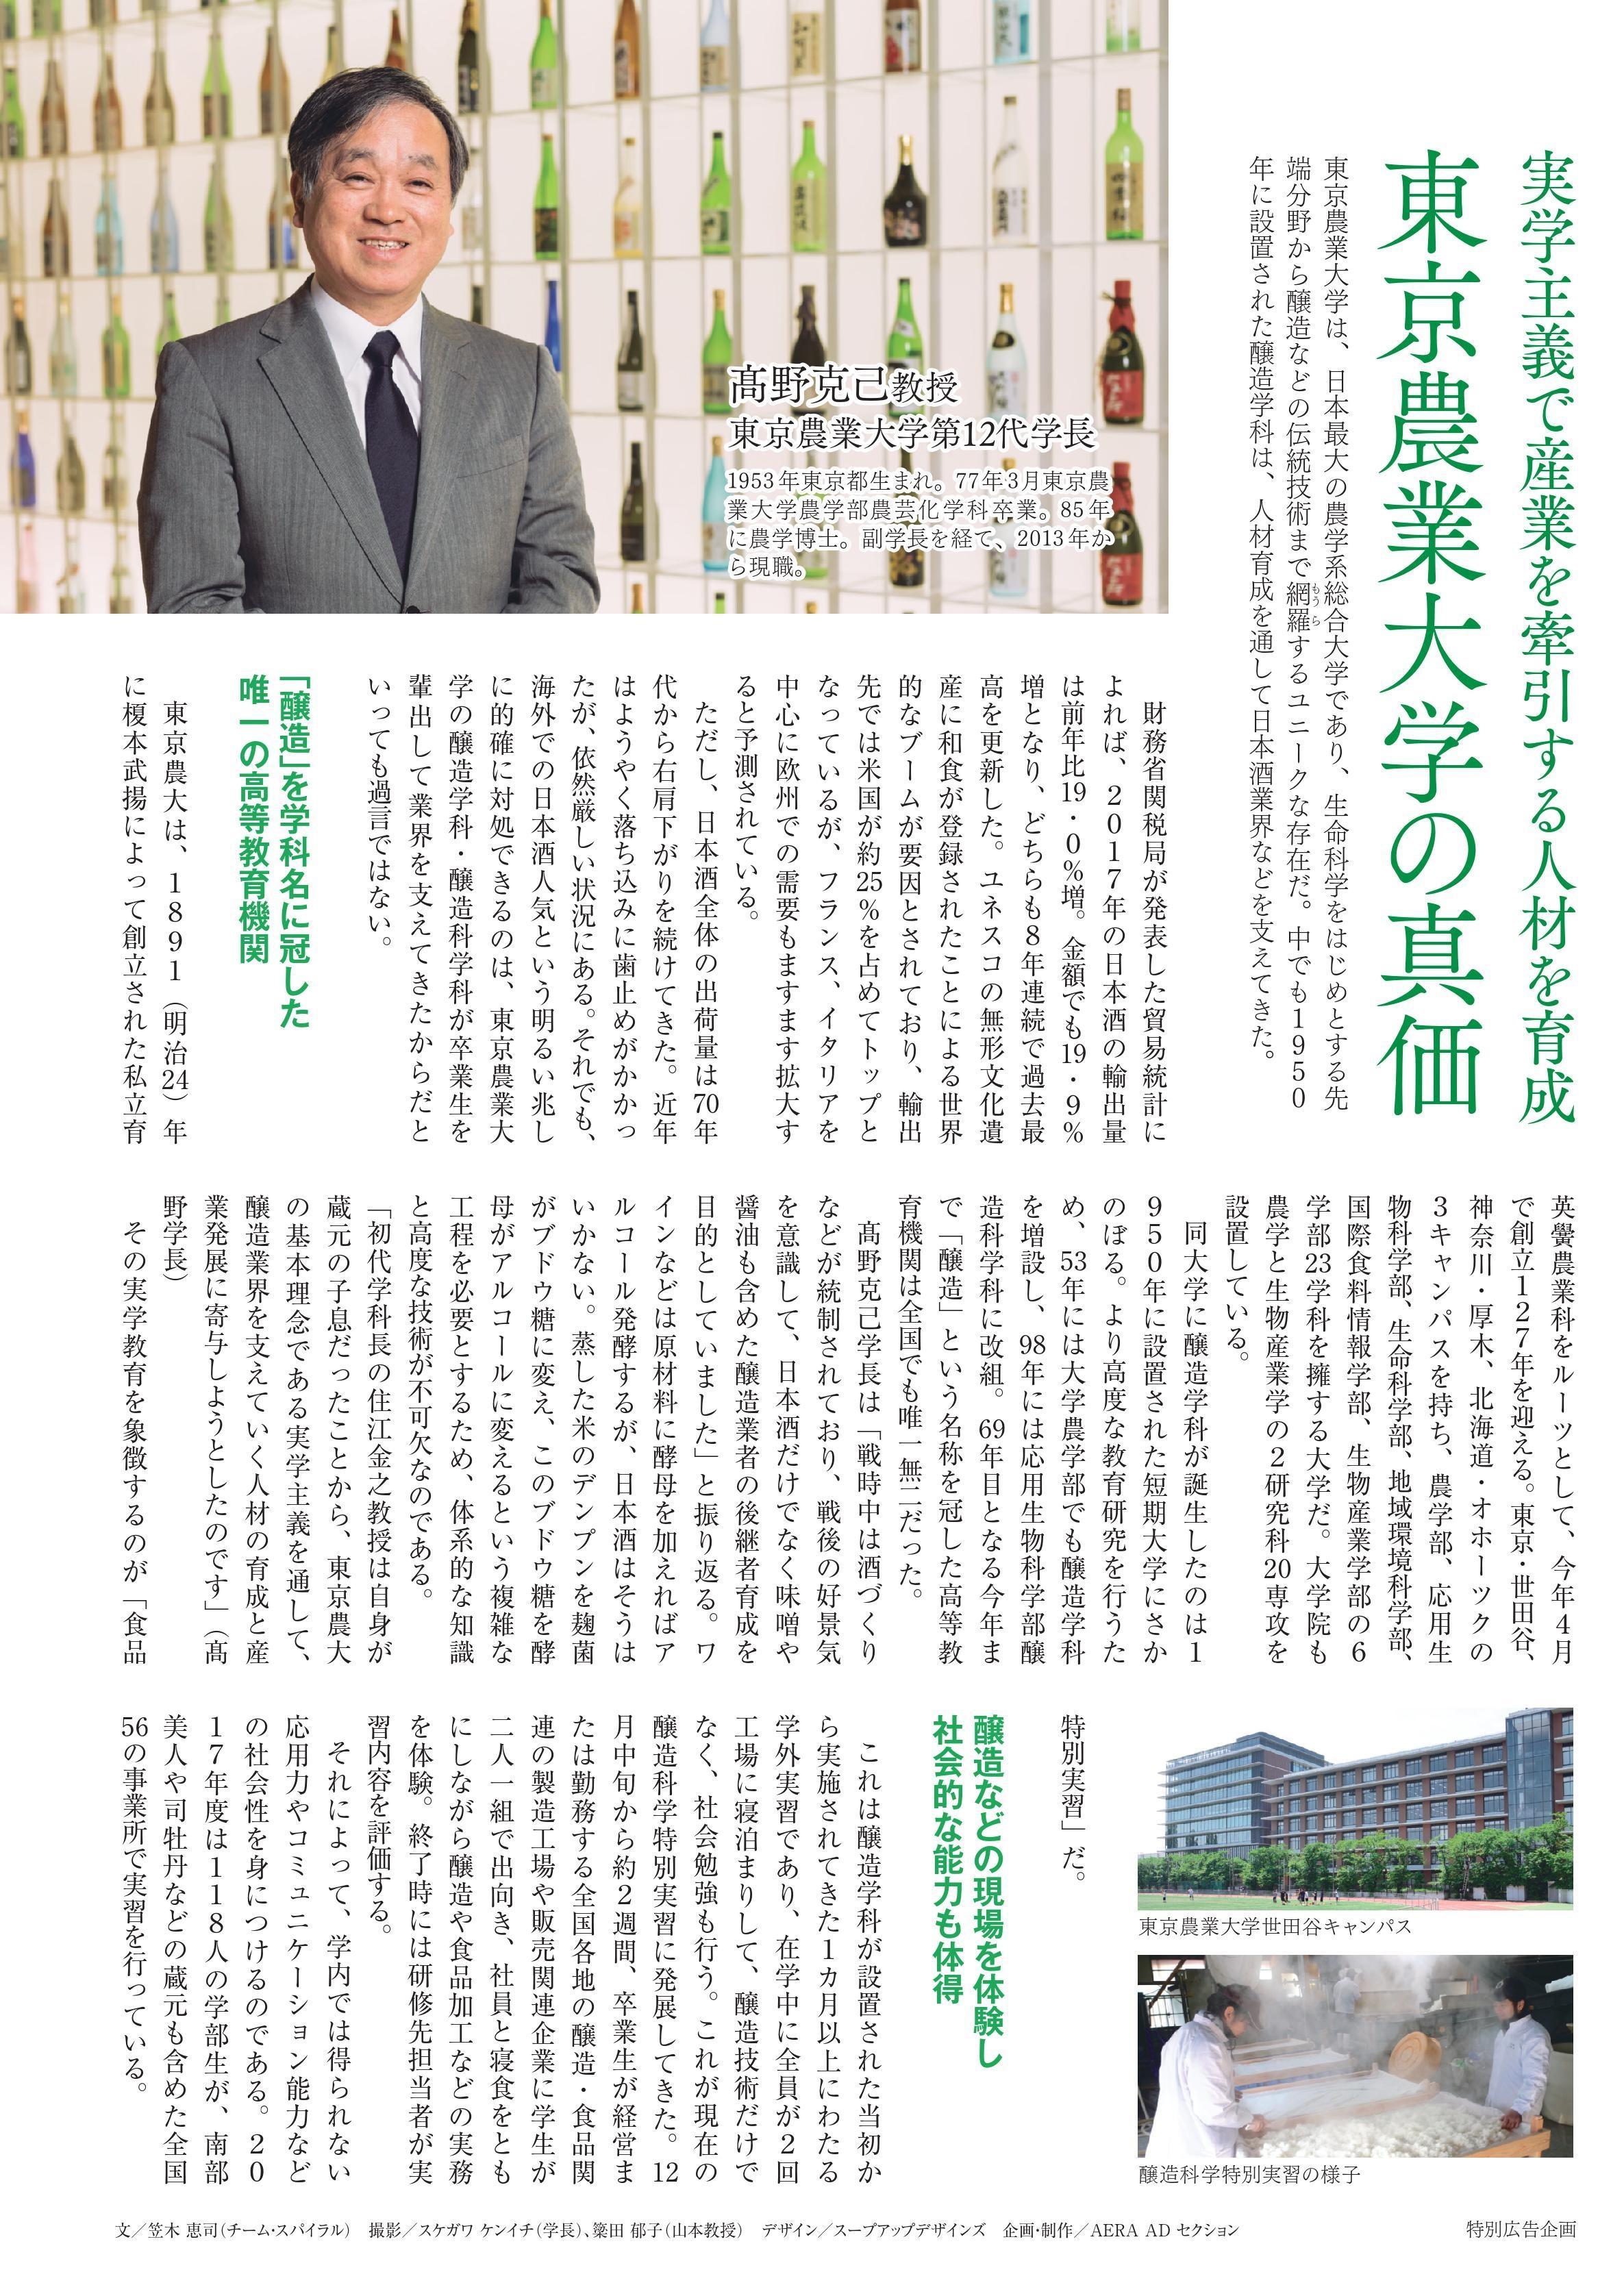 news-20180329-1.jpg